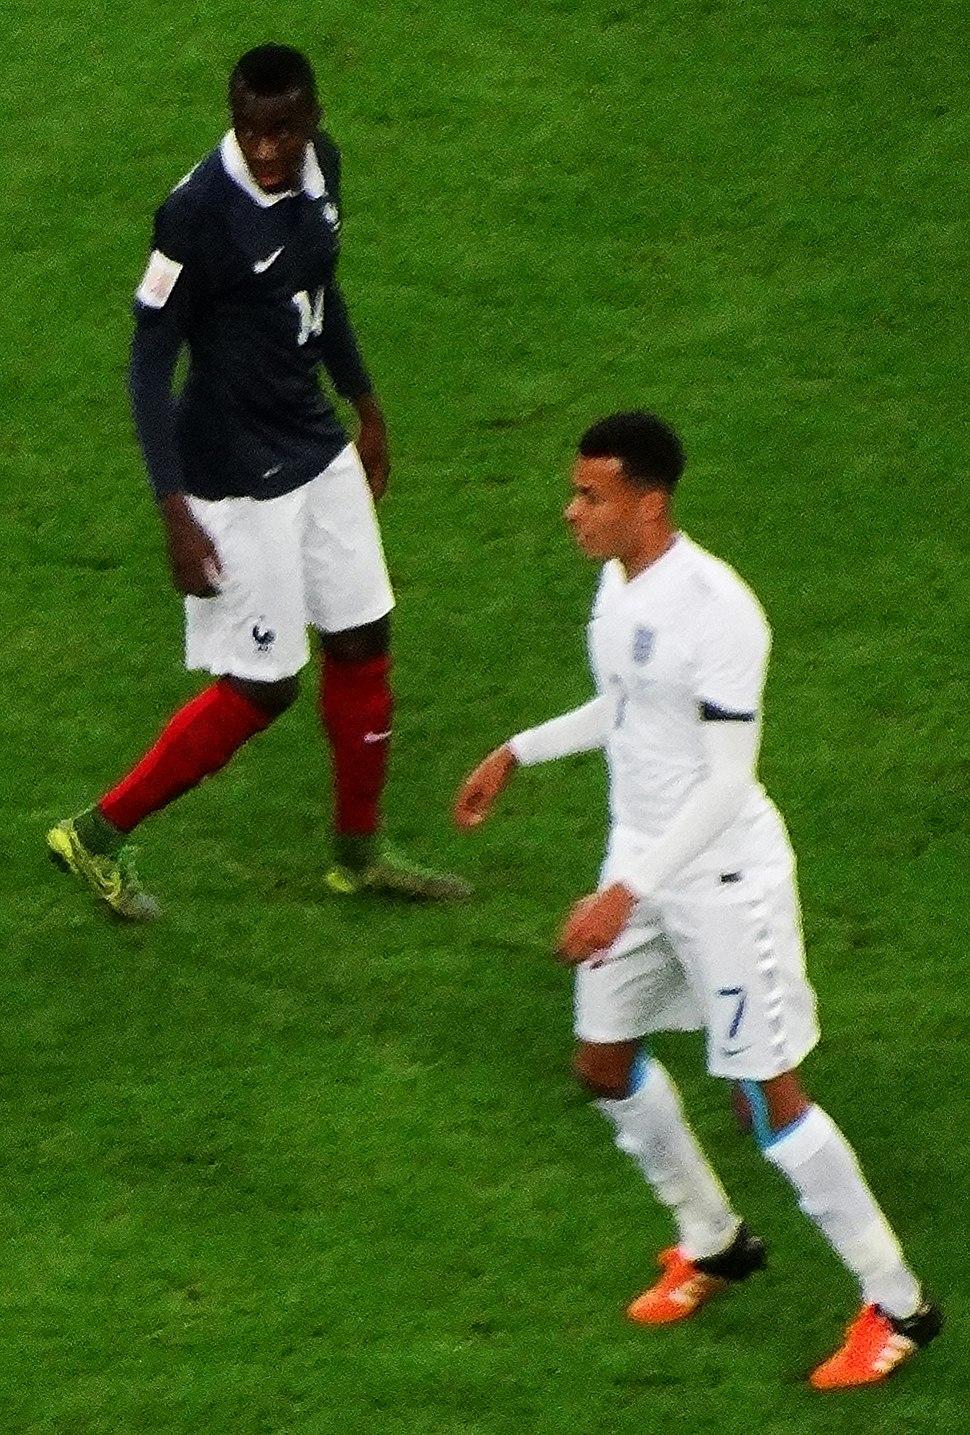 France midfielder Blaise Matuidi and England midfielder Dele Alli (23125466531)